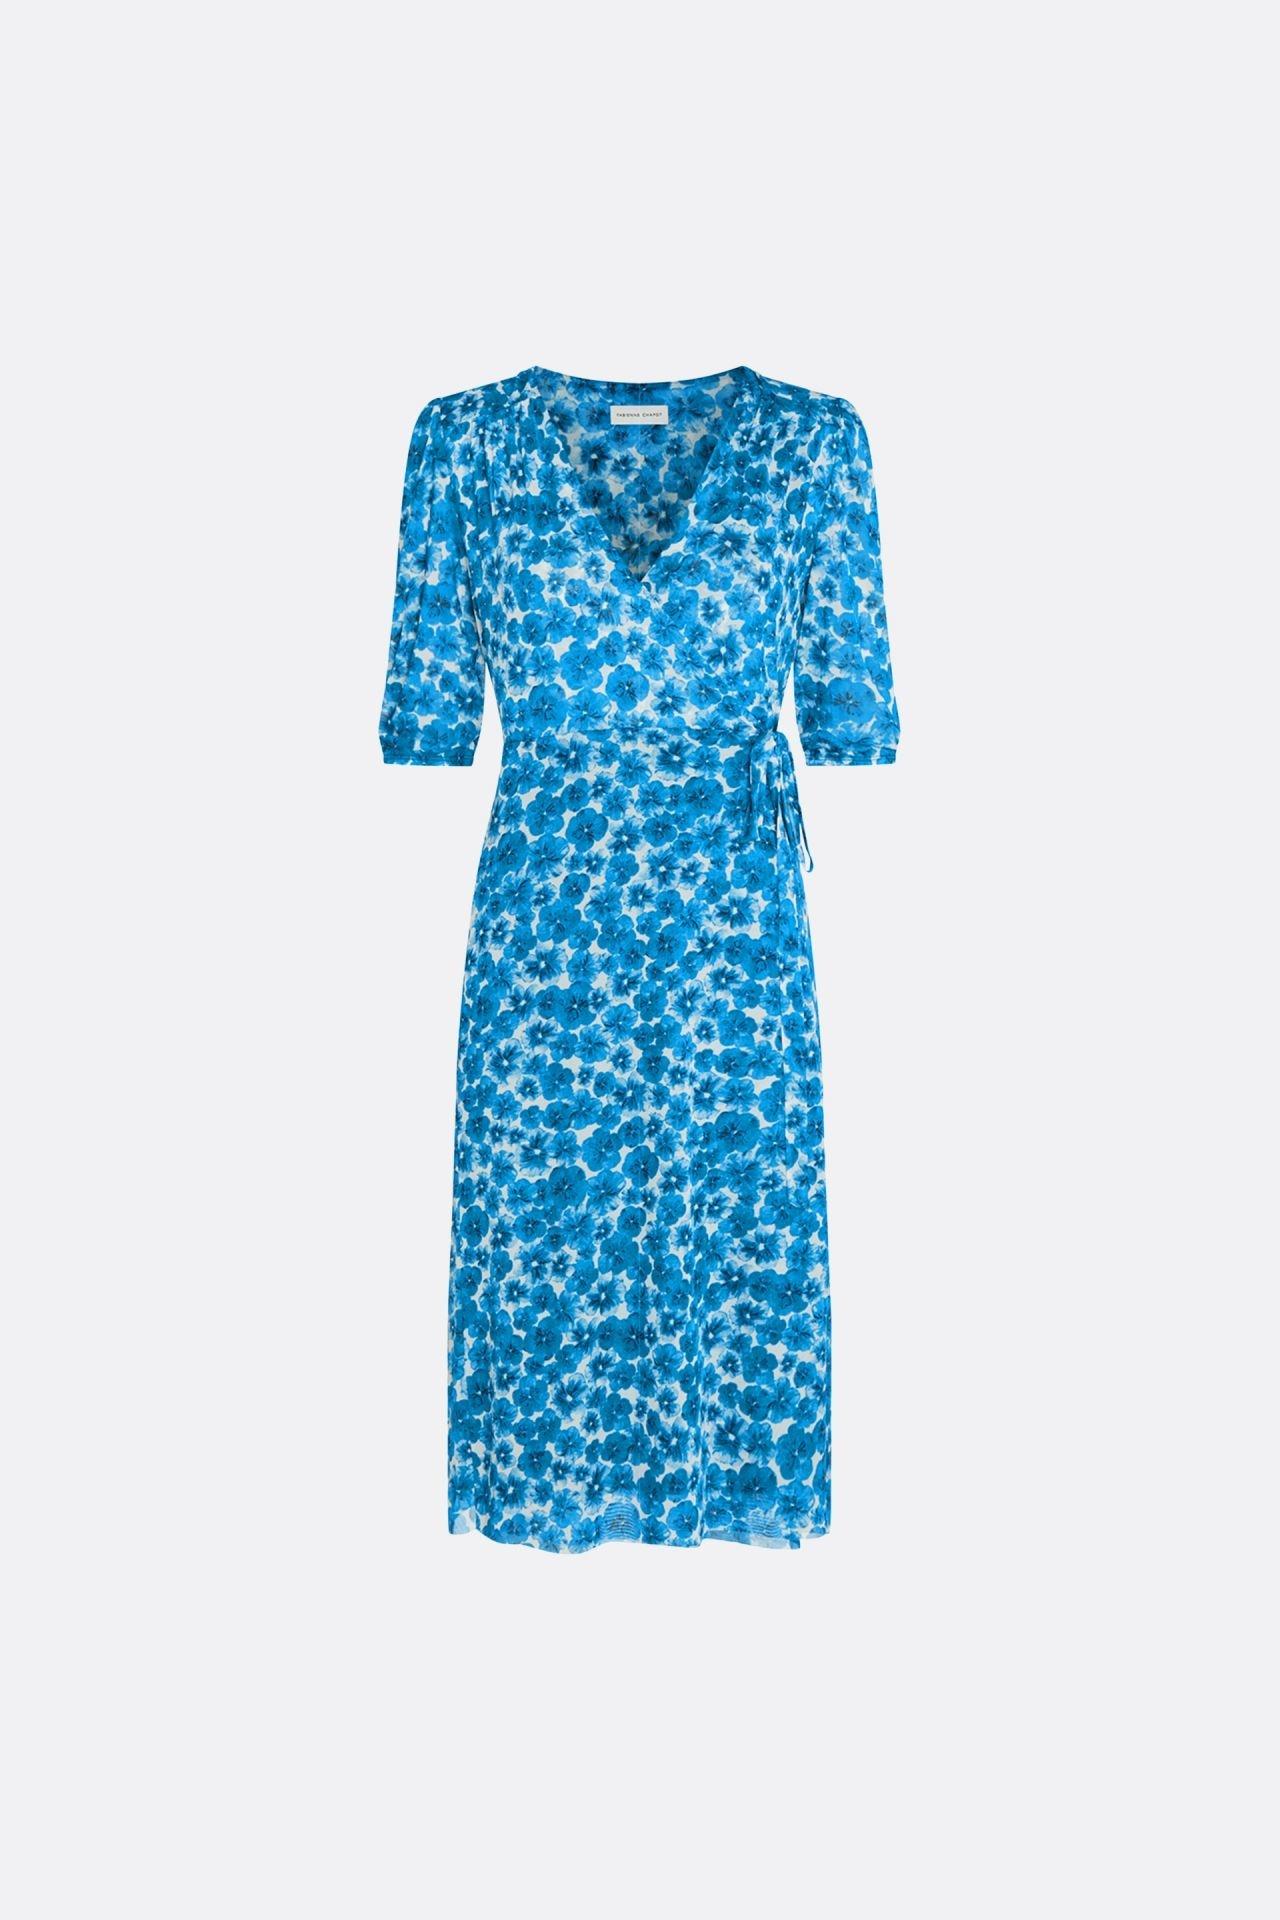 Fabienne Chapot Dress MELISSA CLT-77-1